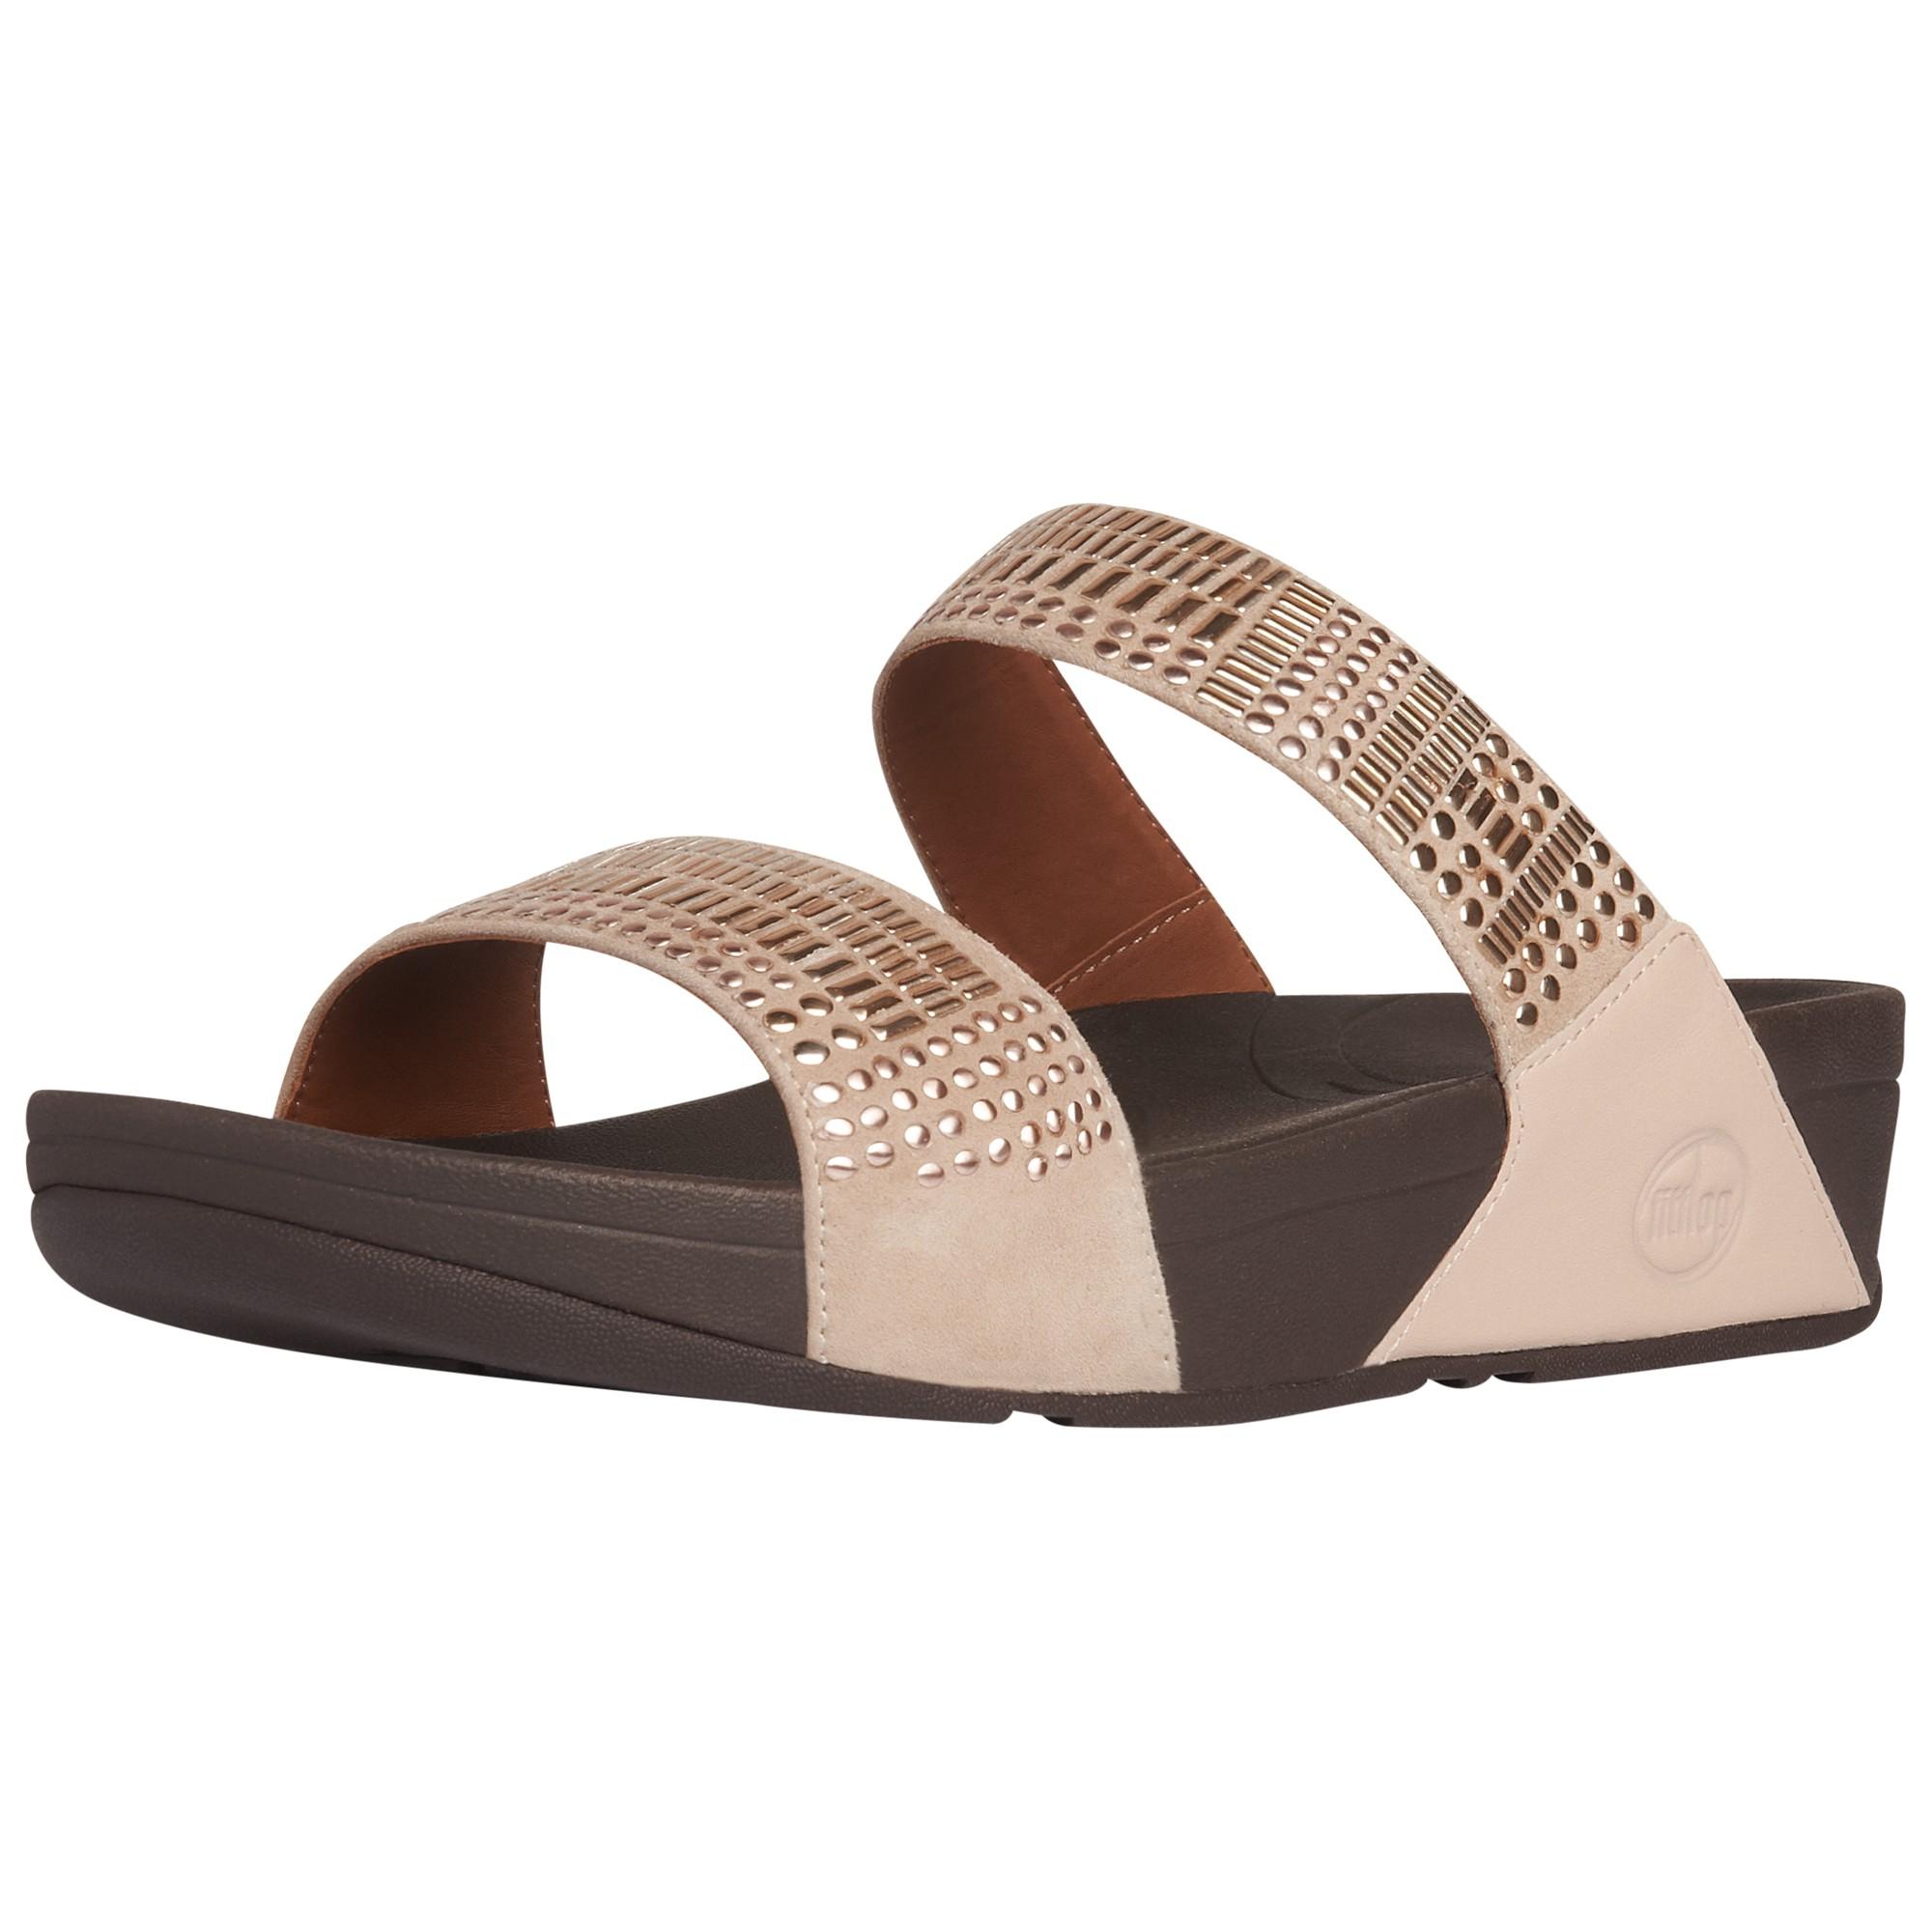 aa2f1b188 Fitflop Aztek Chada Slide Suede Sandals in Pink - Lyst